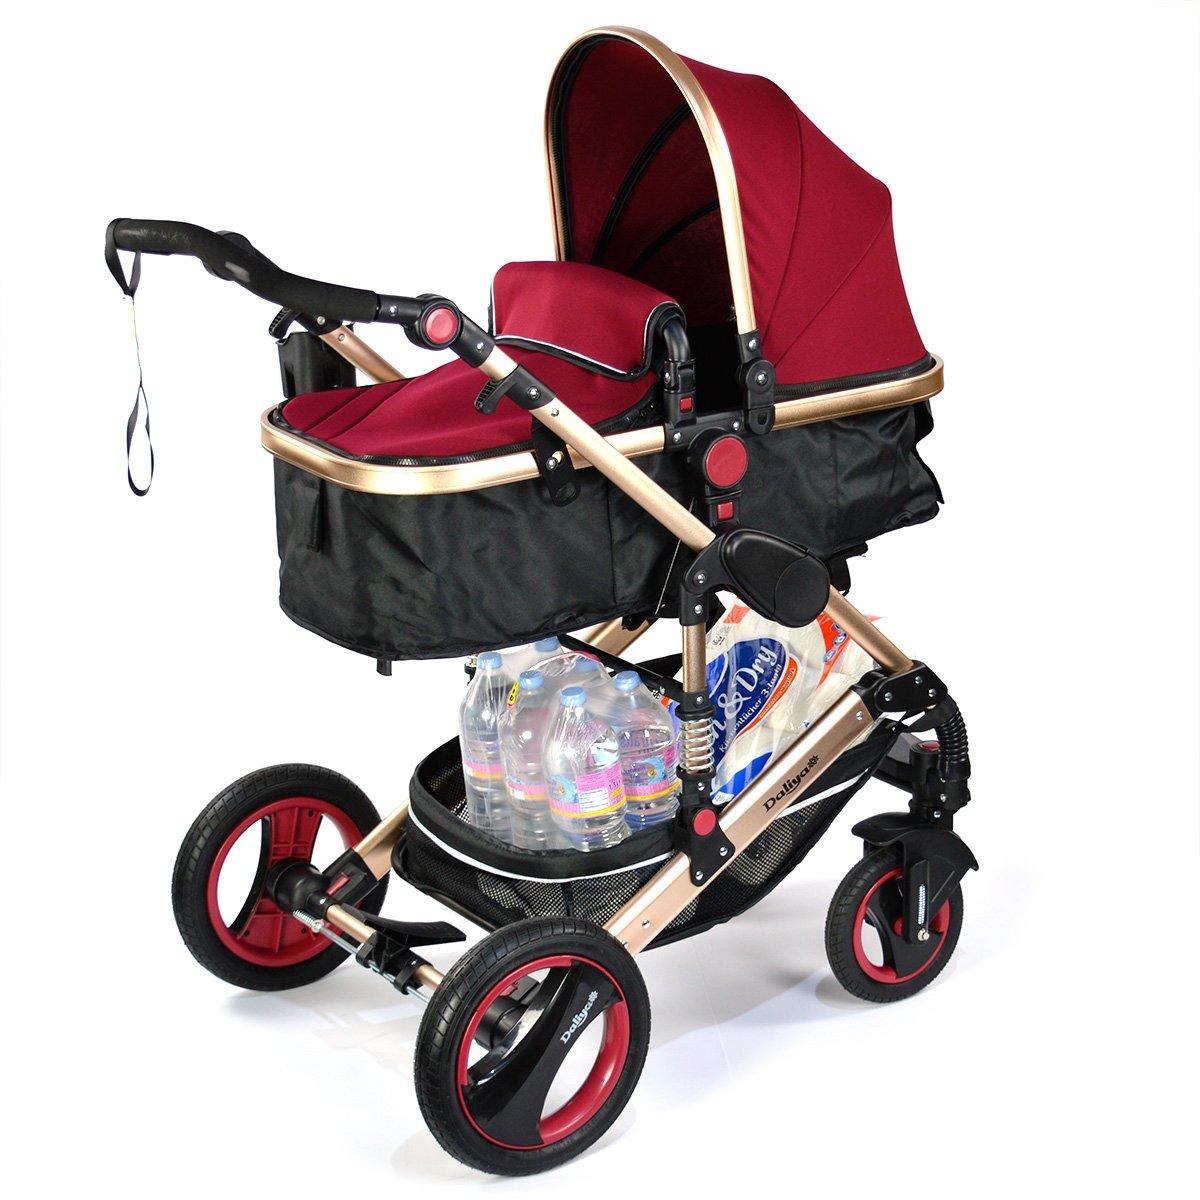 2 in 1 Kinderwagen Farbe Bordeaux Rot Schwarz - Bambimo - Kombi Kinderwagen - Buggy - Sportsitz - Babywanne - Aluminium Rahmen - Abnehmbare Reifen - Extra Größe Bereifung Daliya